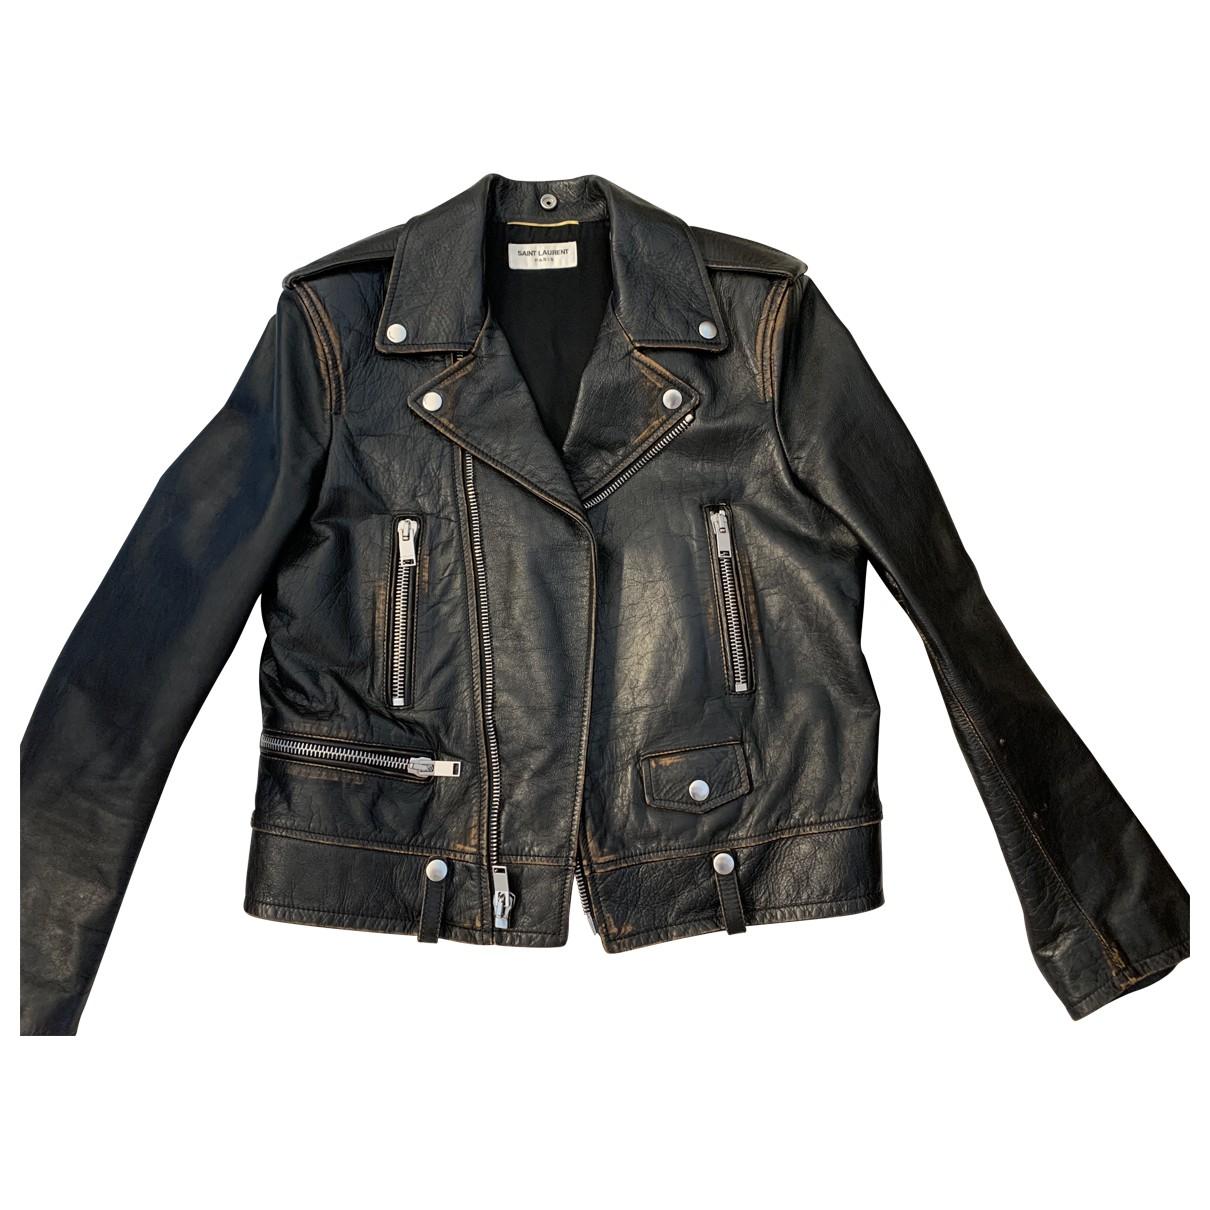 Saint Laurent N Brown Leather Jacket for Women